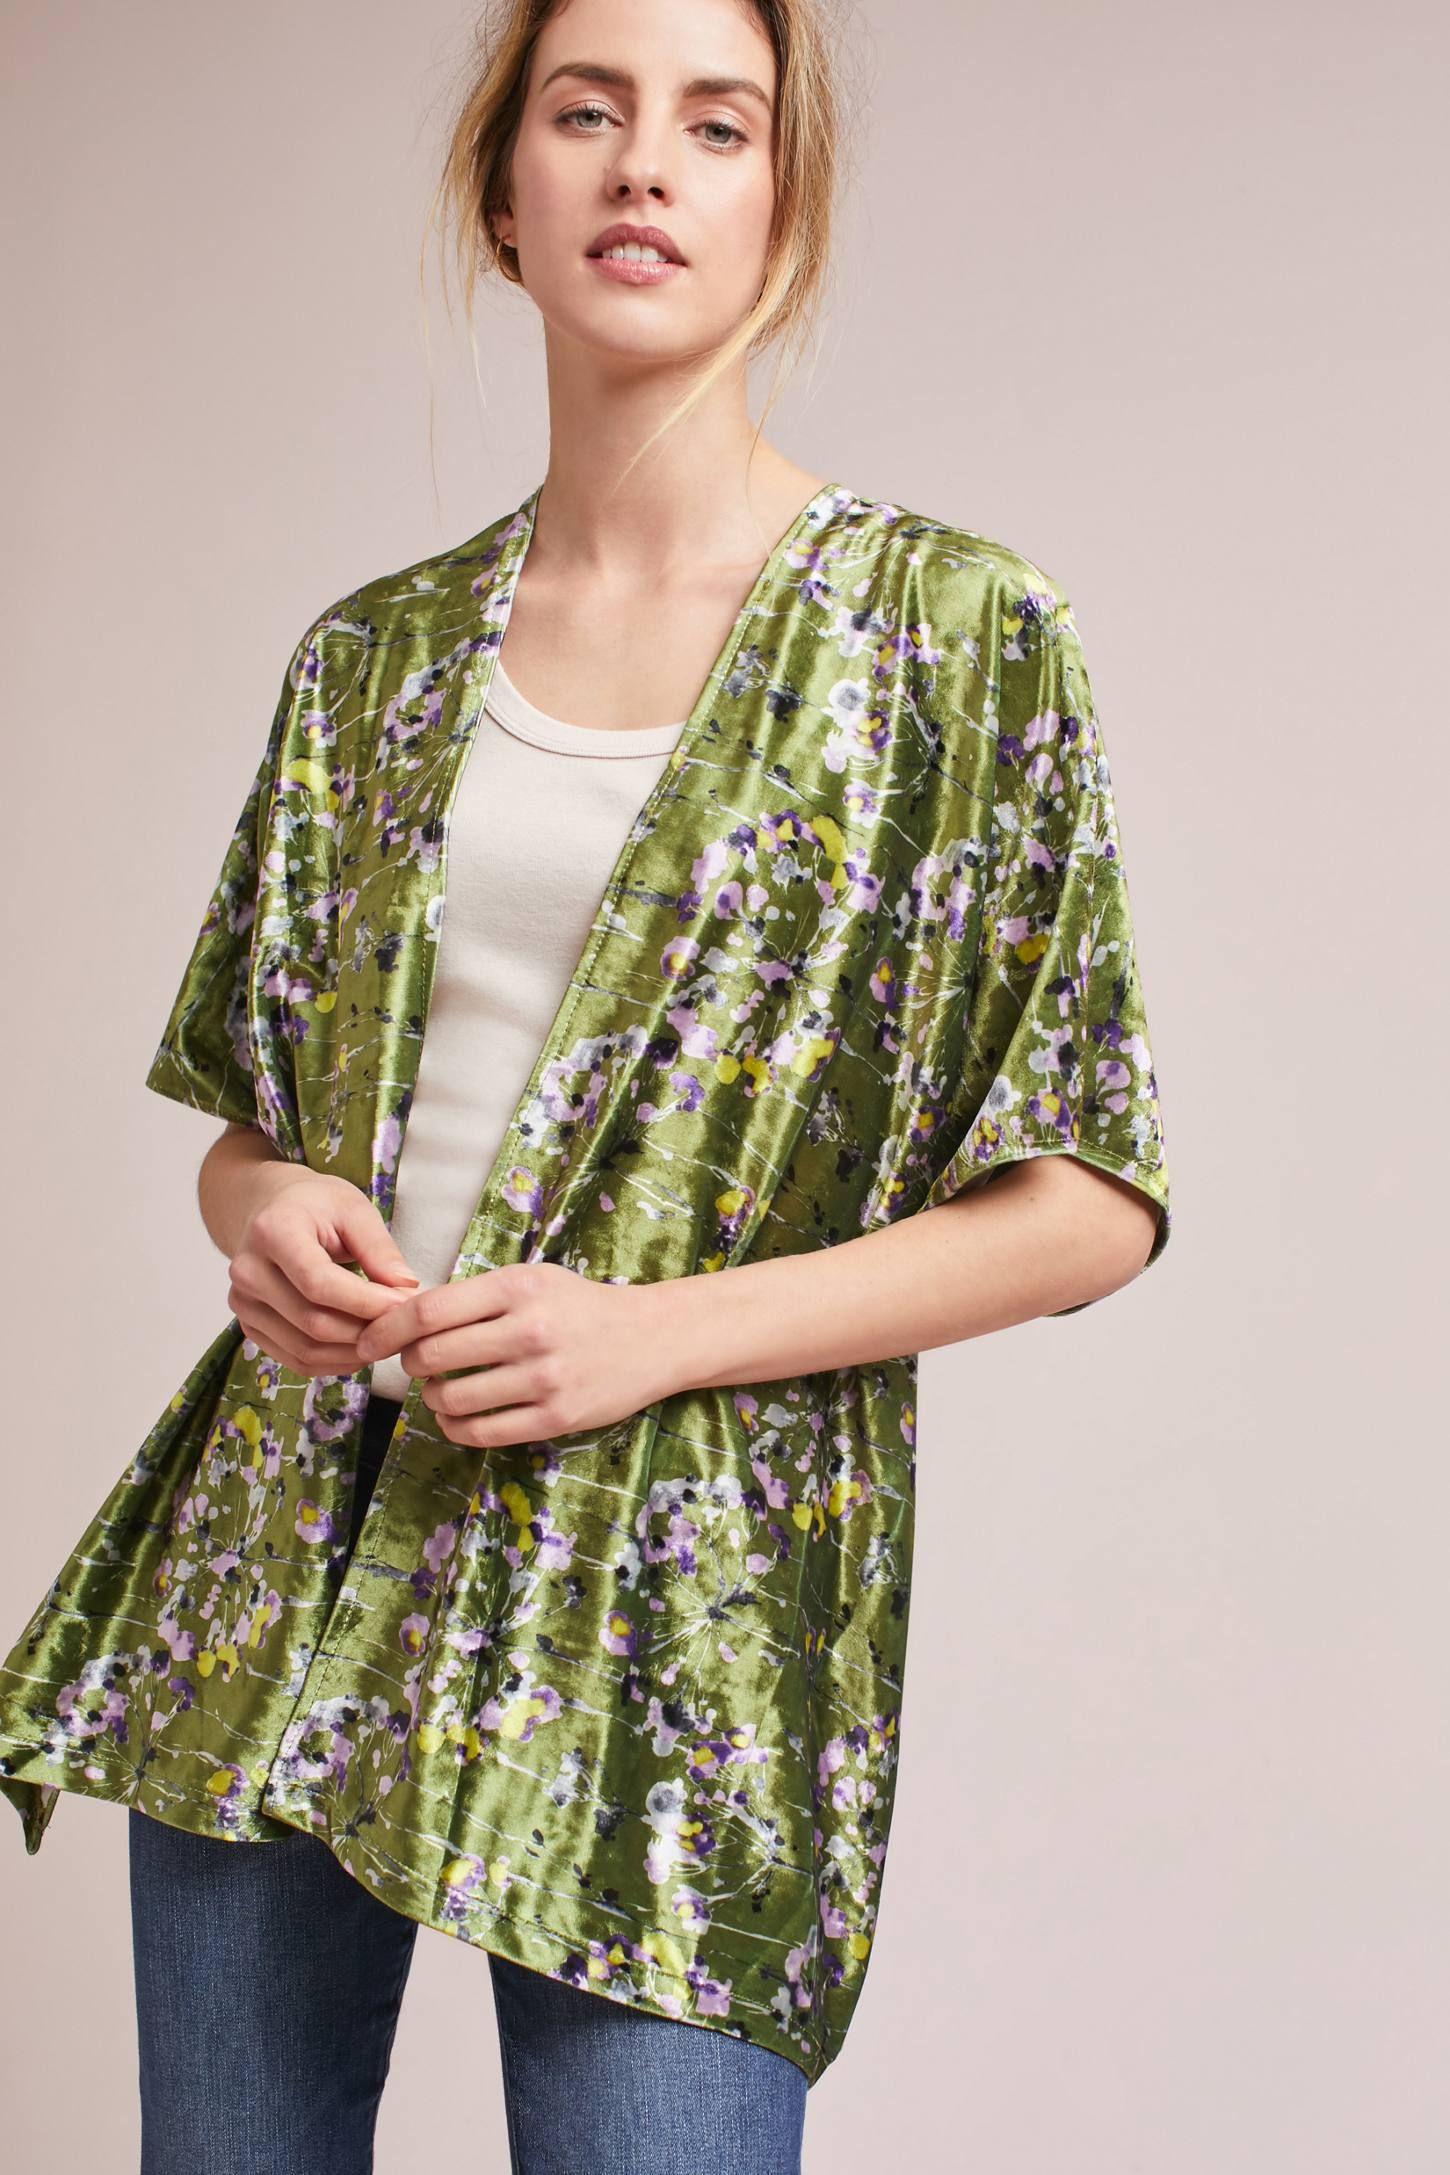 Shop the Callaway Floral Velvet Kimono and more